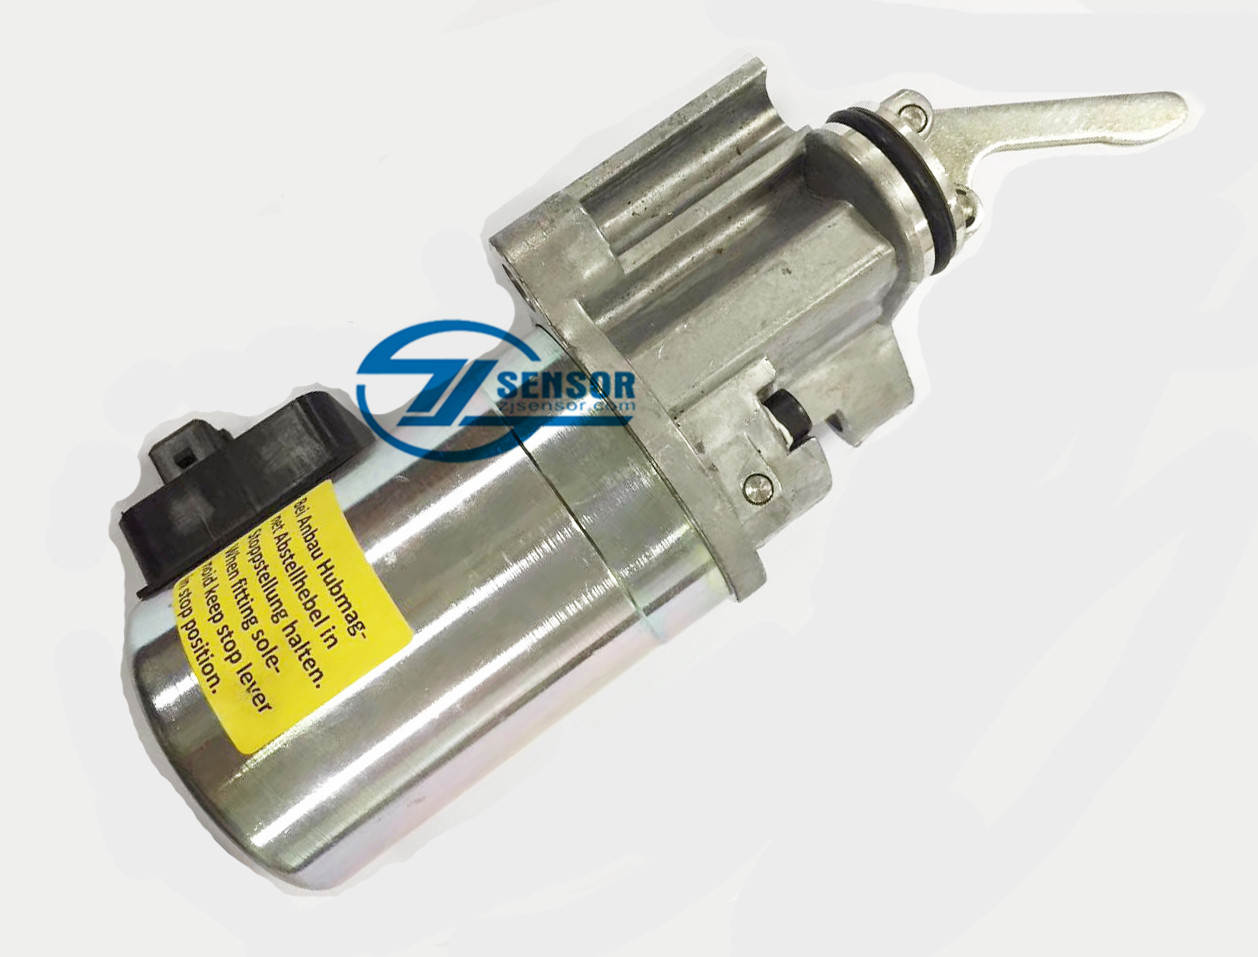 04199903 24V Fuel Shutdown Solenoid Valve 0419 9903,0419-9903 For DEUTZ BFM1013